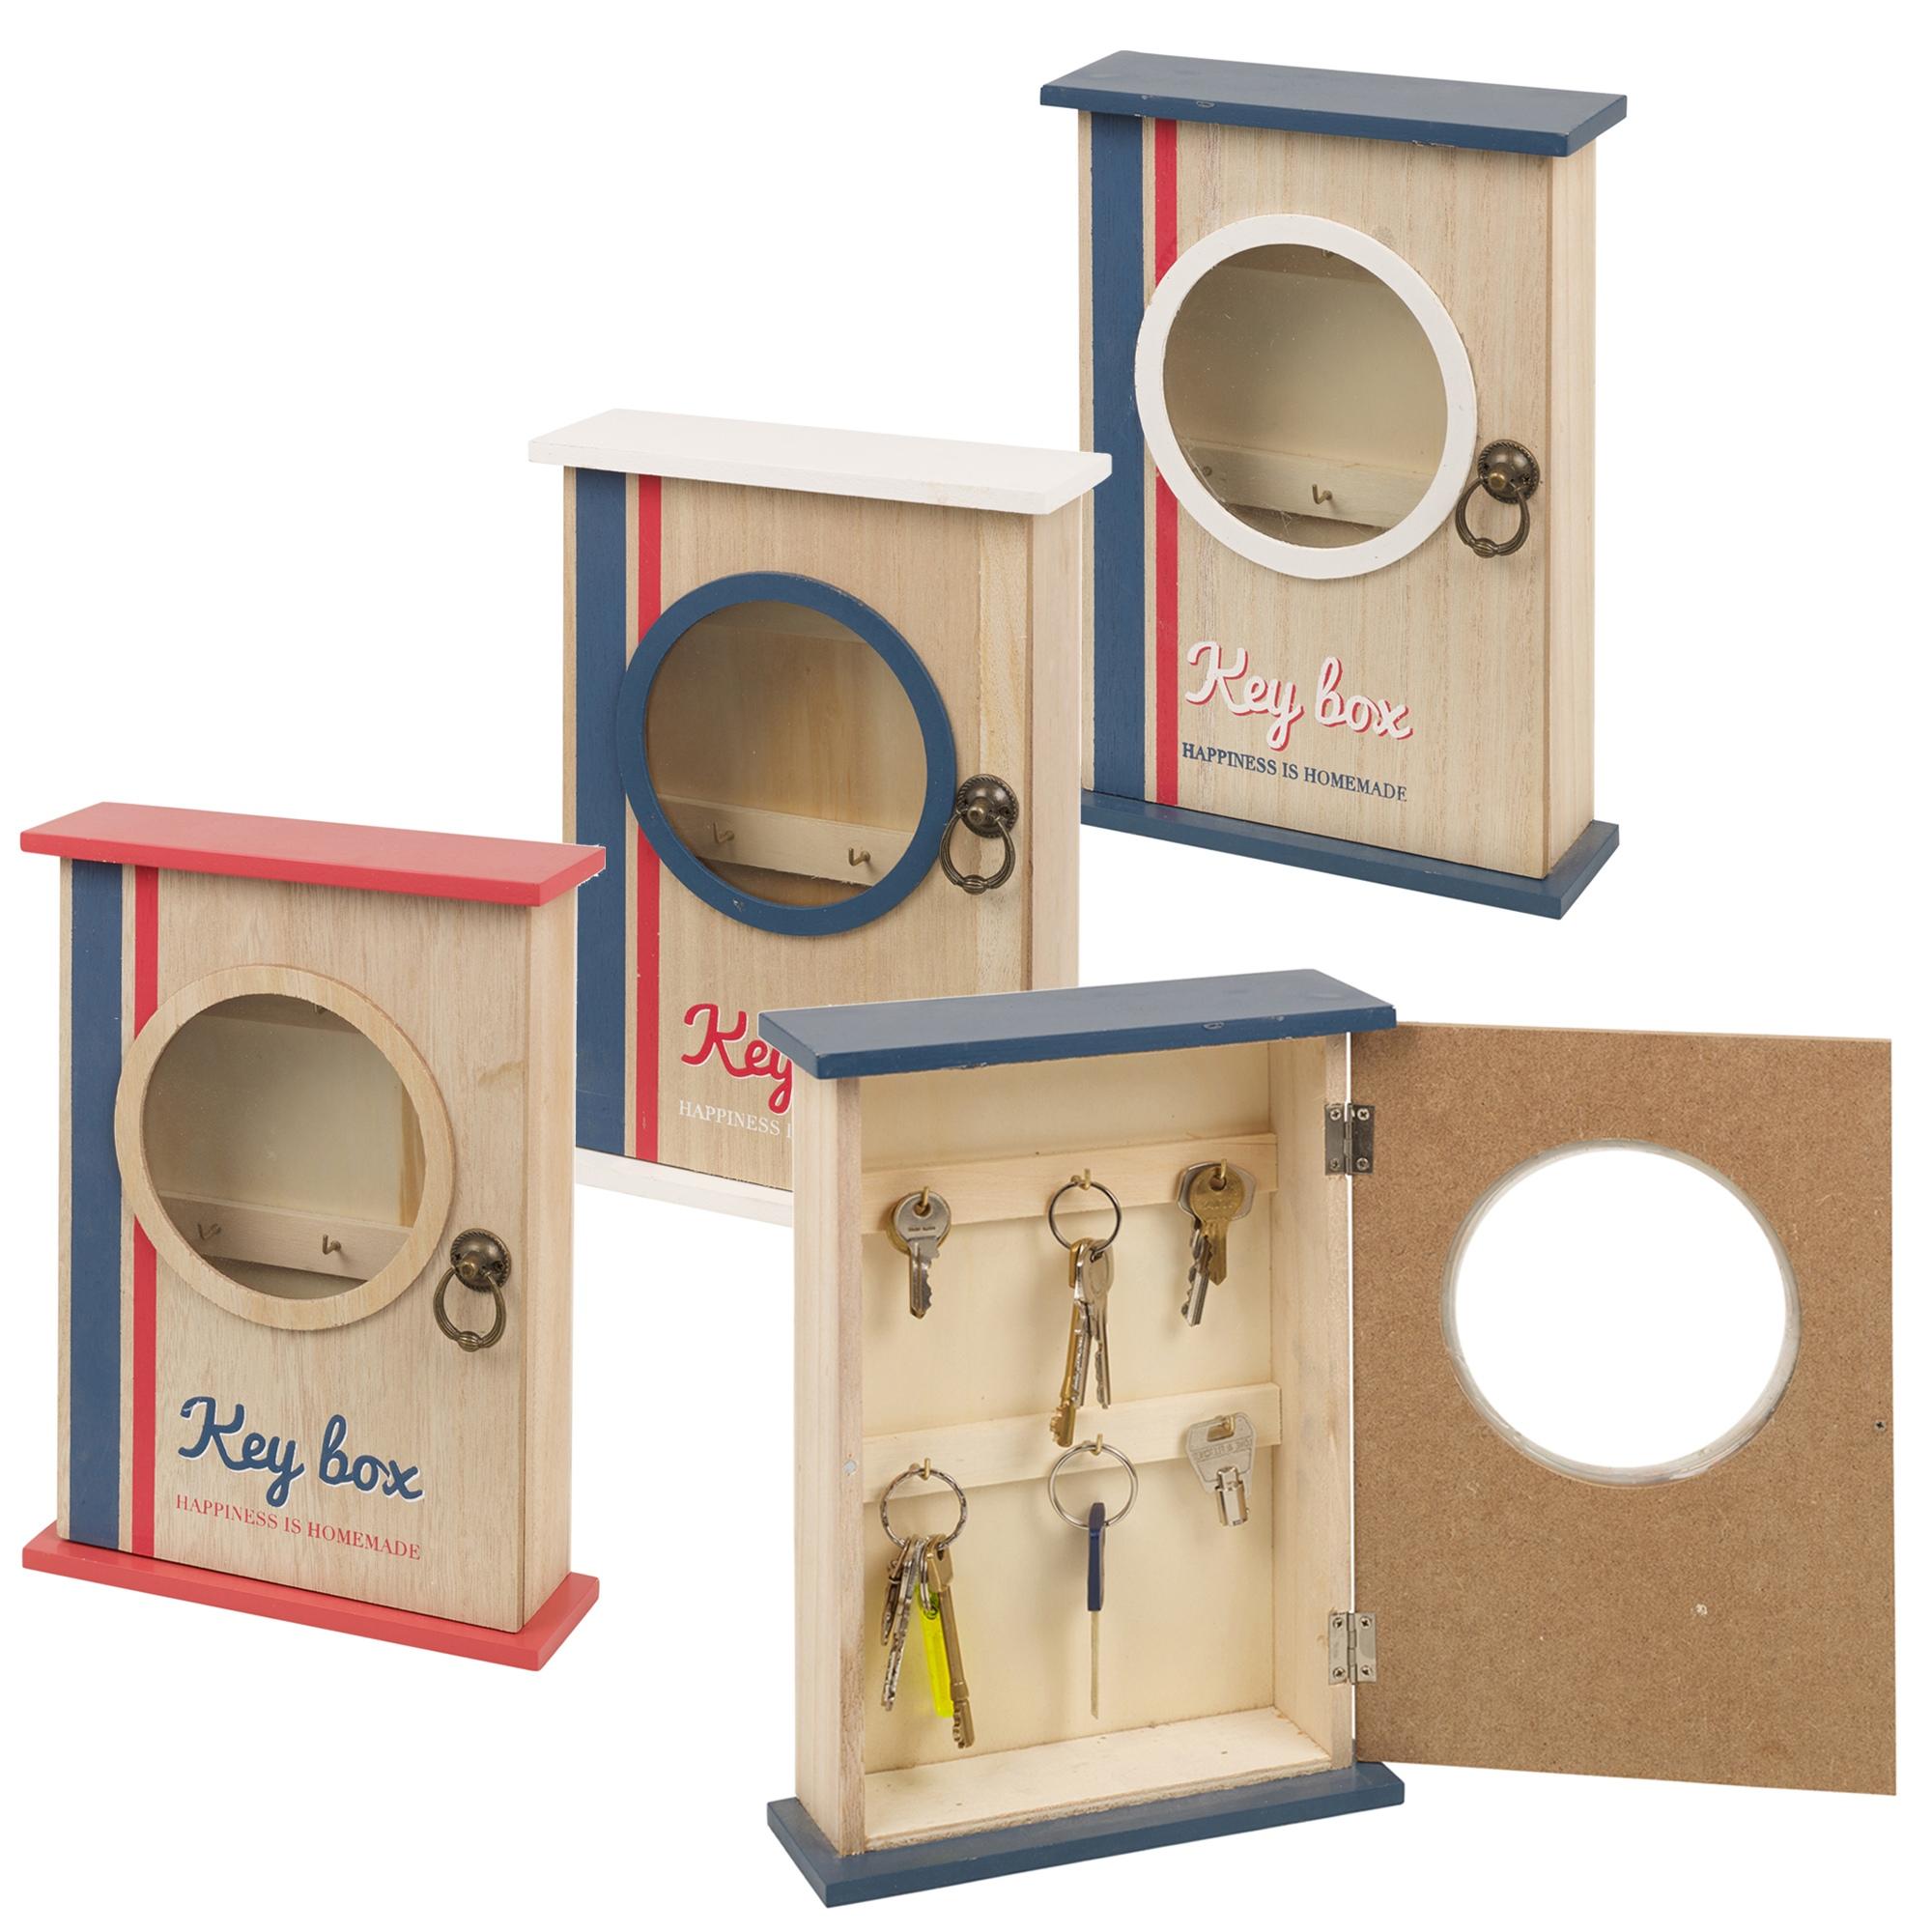 6 hooks wooden key box magnetic door lock closure wall